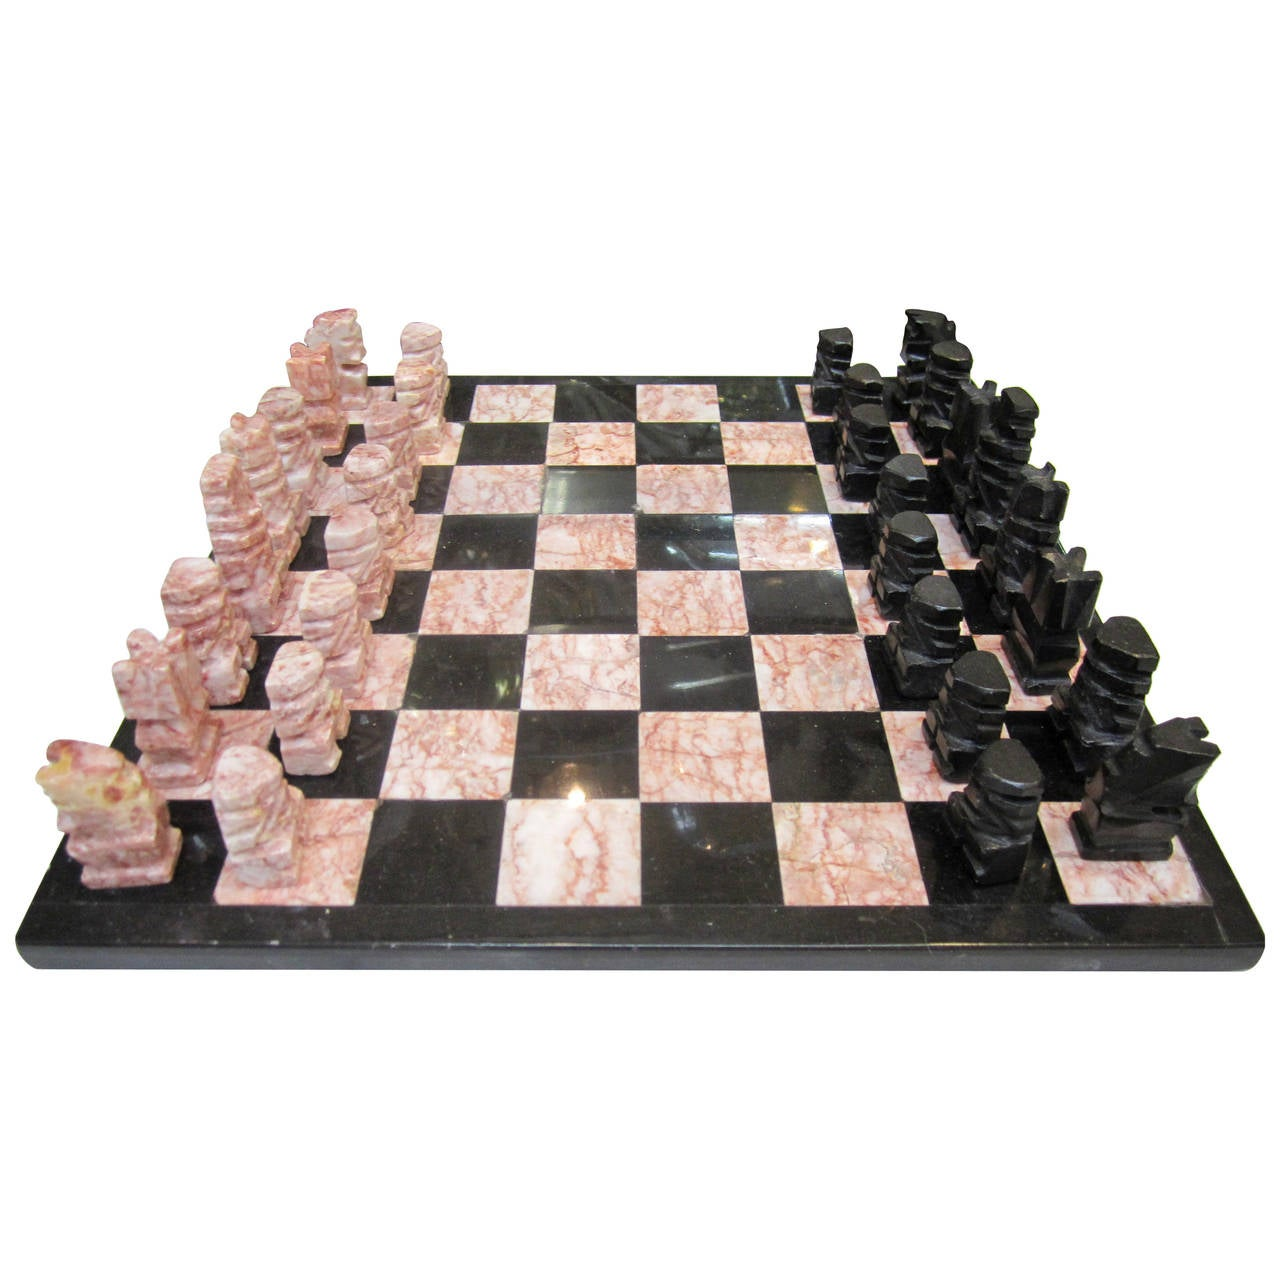 Onyx marble chess set foto bugil bokep 2017 - Granite chess set ...